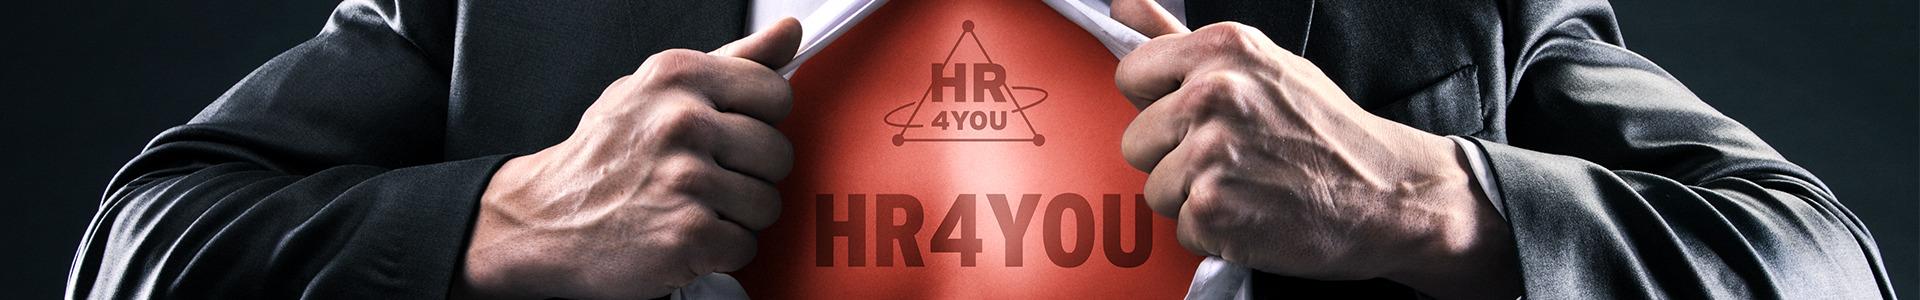 HR4YOU-PRO